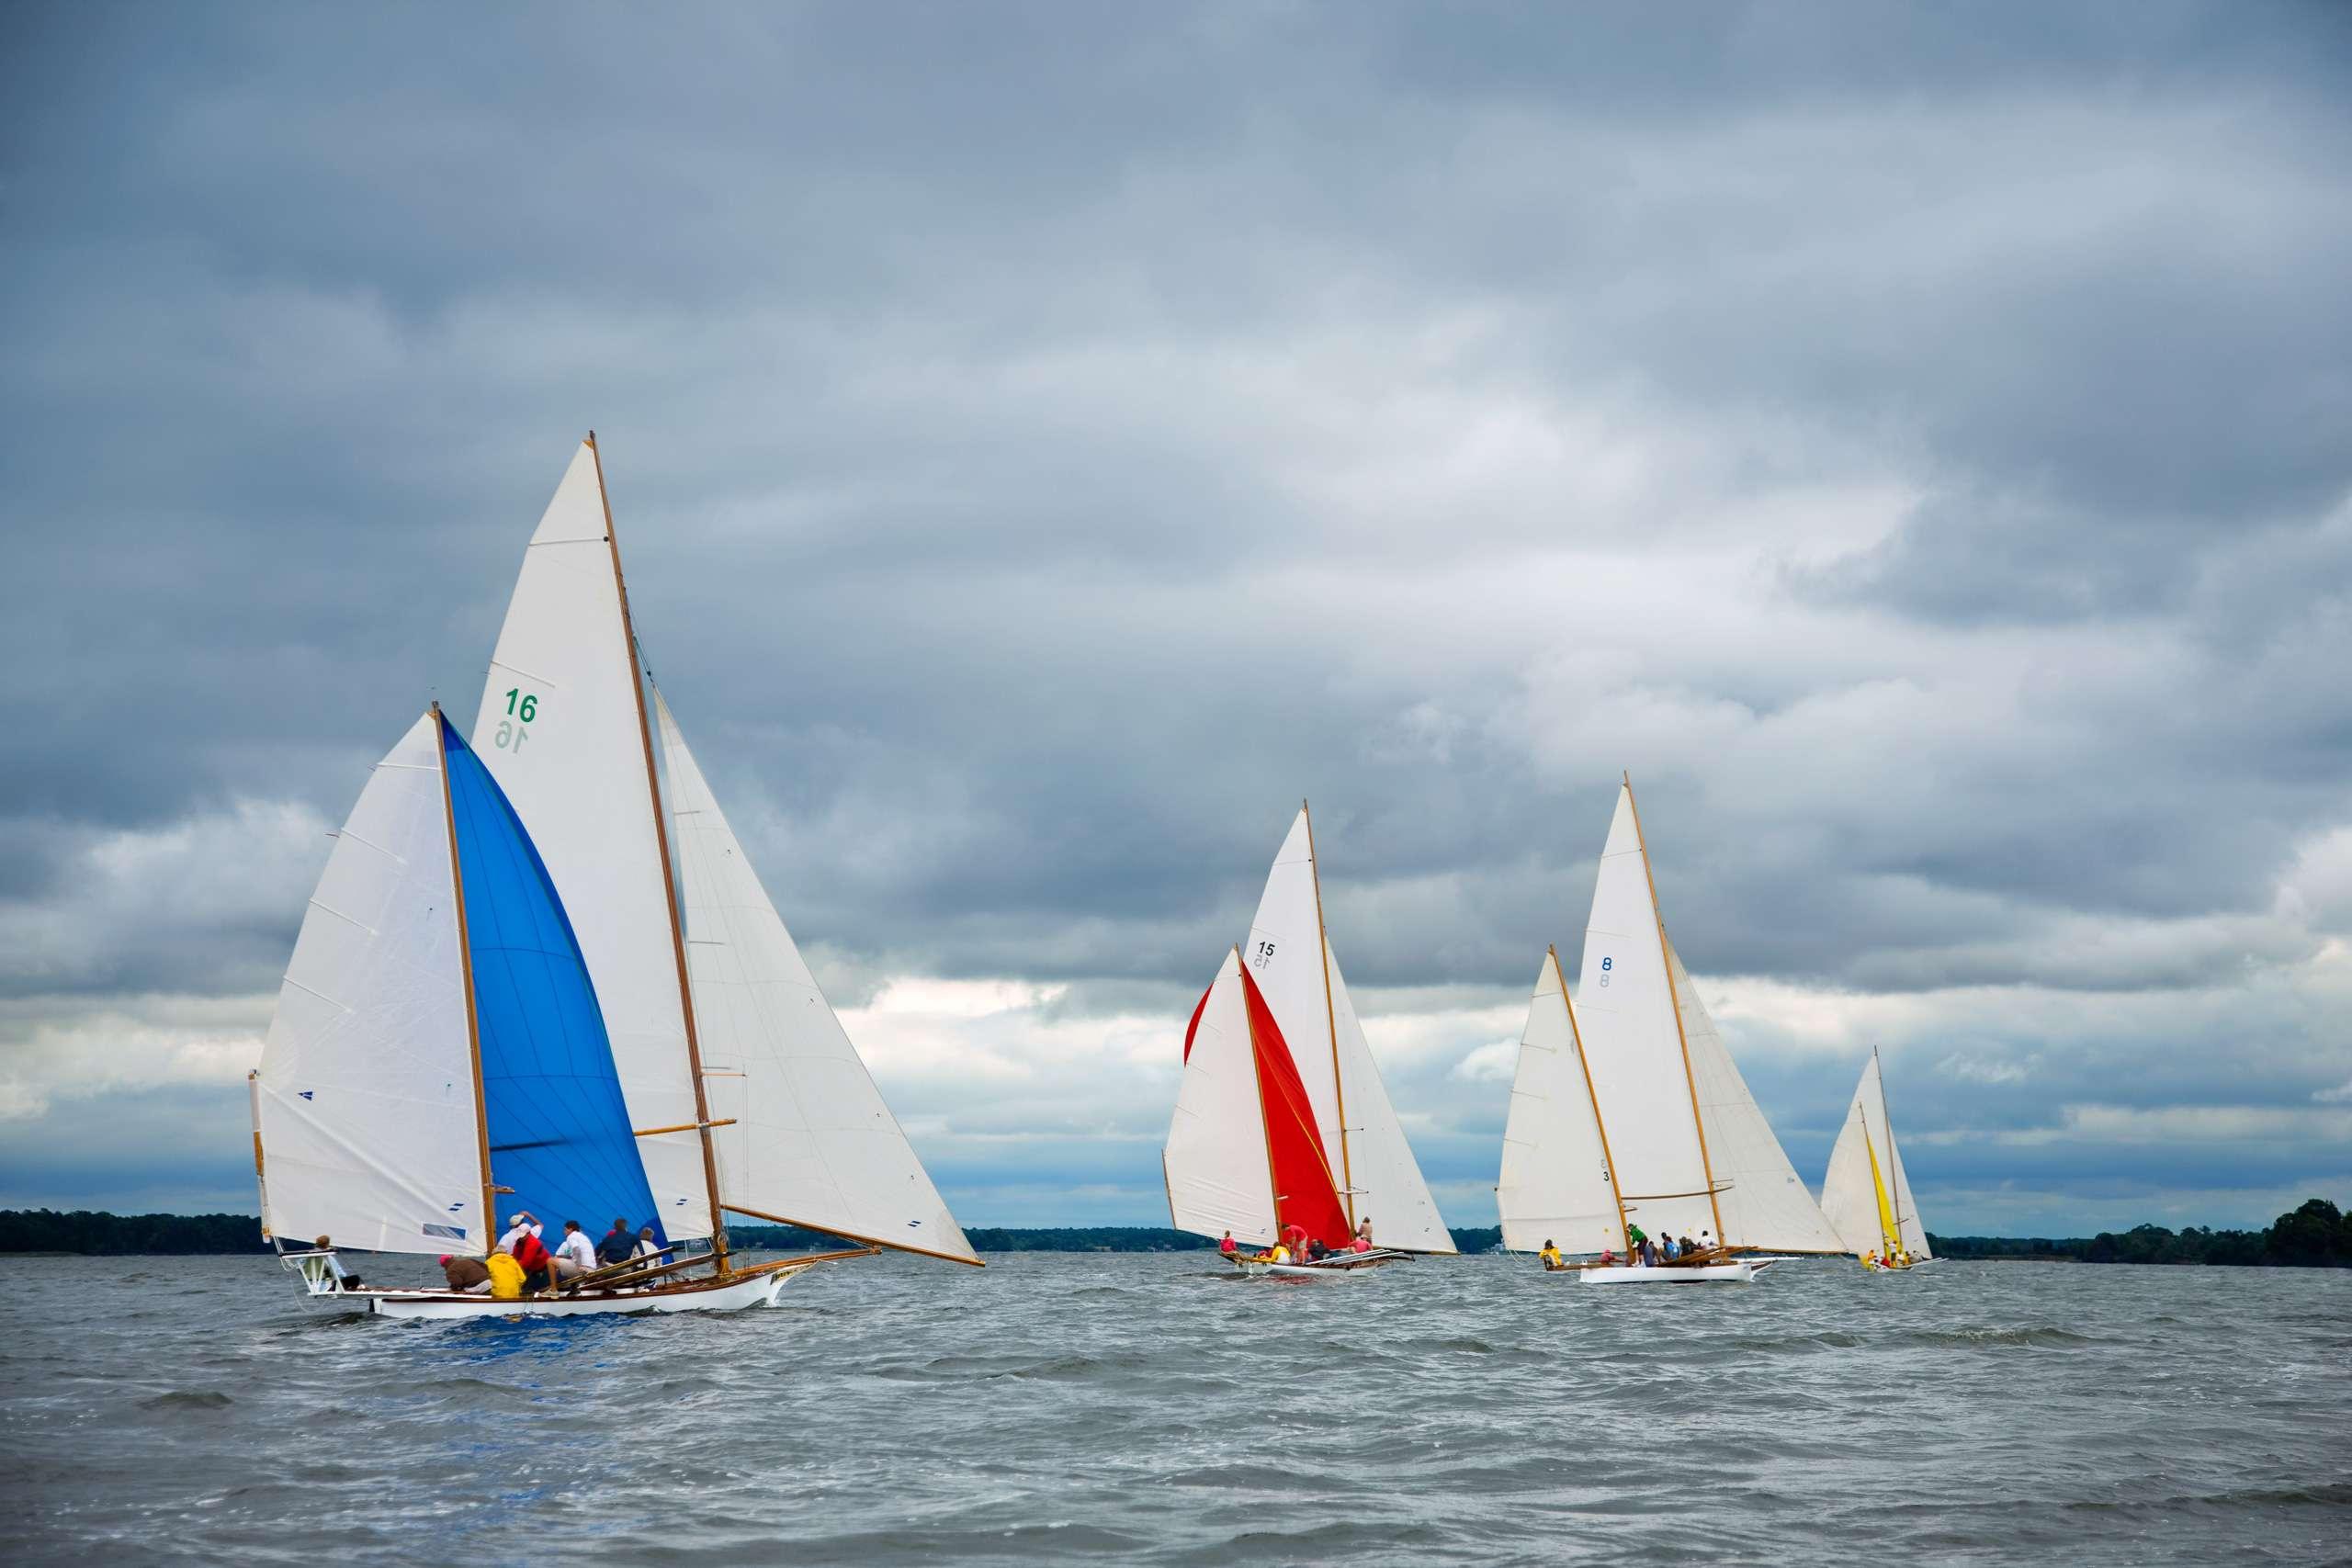 PORTFOLIO - Sailing - Log Canoes #16   PCG524